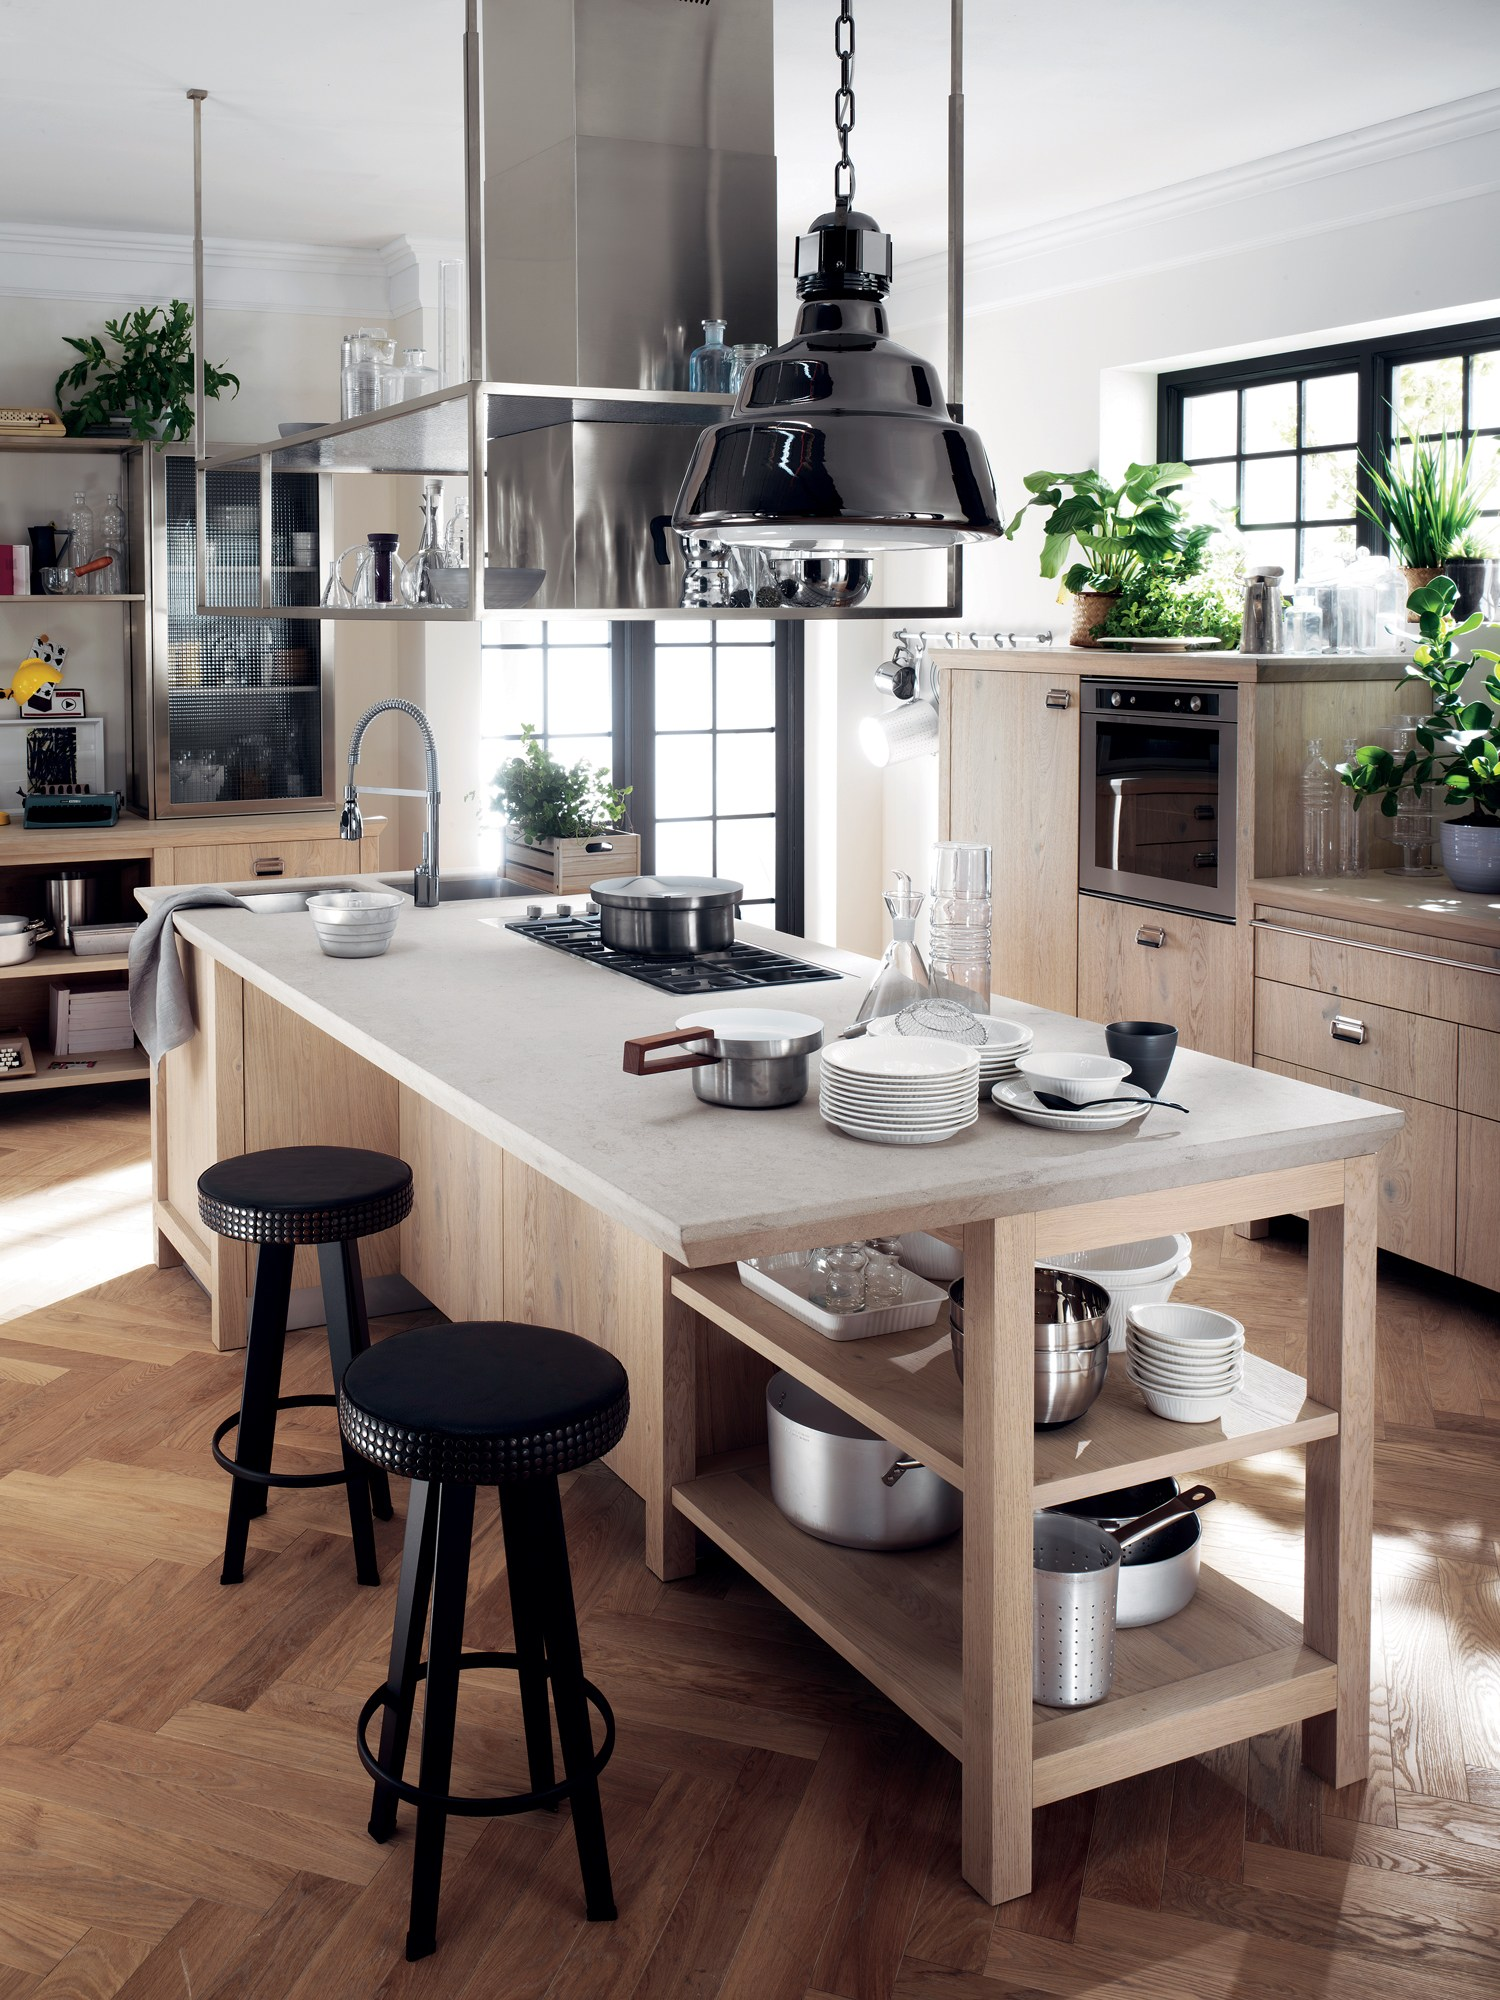 Cucina componibile diesel social kitchen linea scavolini - Scavolini cucine diesel ...